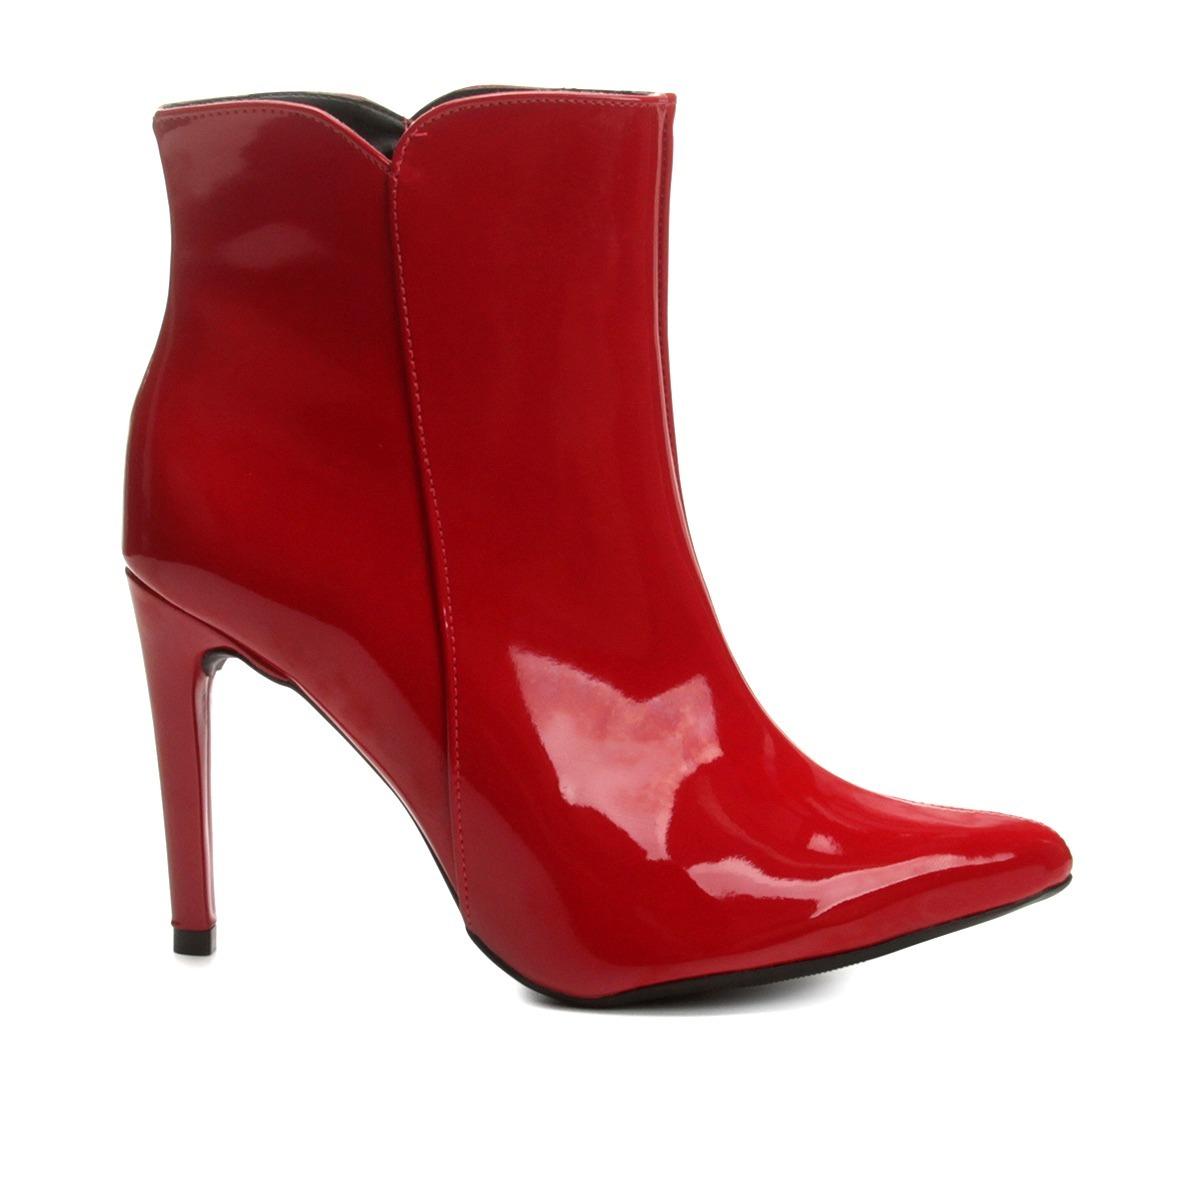 5457560a5 bota feminina cano curto mixage salto fino verniz 3578939. Carregando zoom.